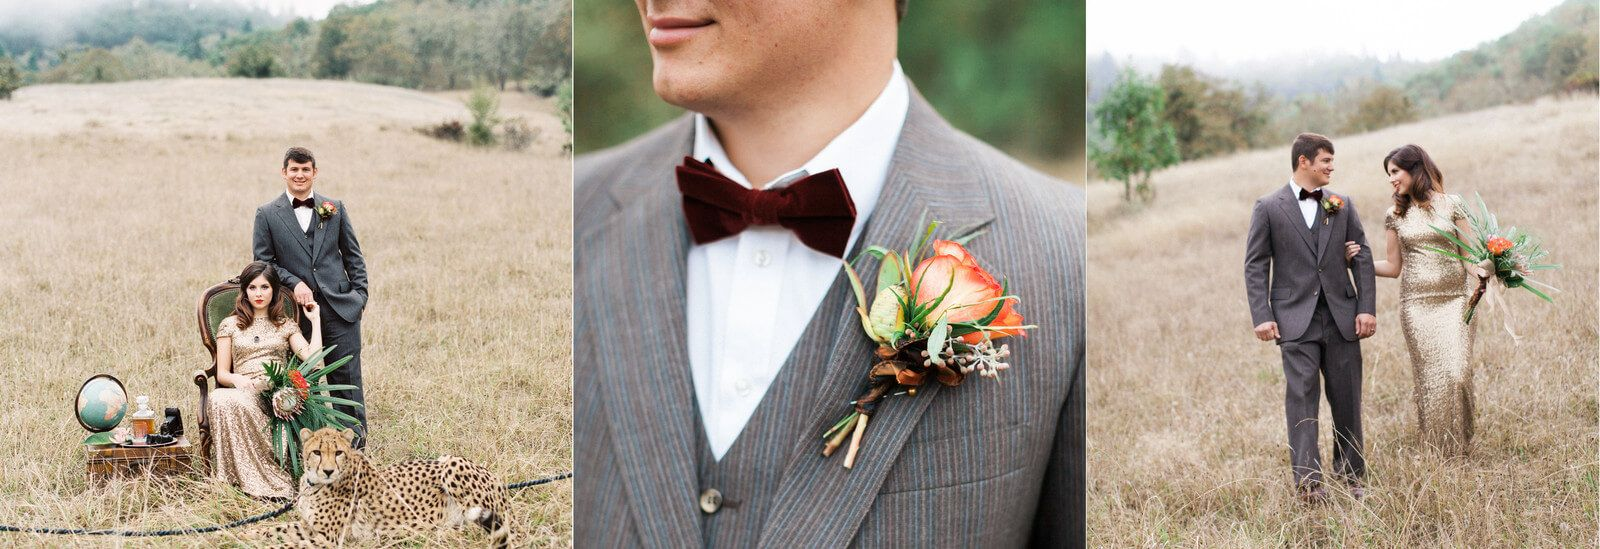 Fall-wedding-Suits.jpg (1600×549)   Men\'s wedding stuff ...